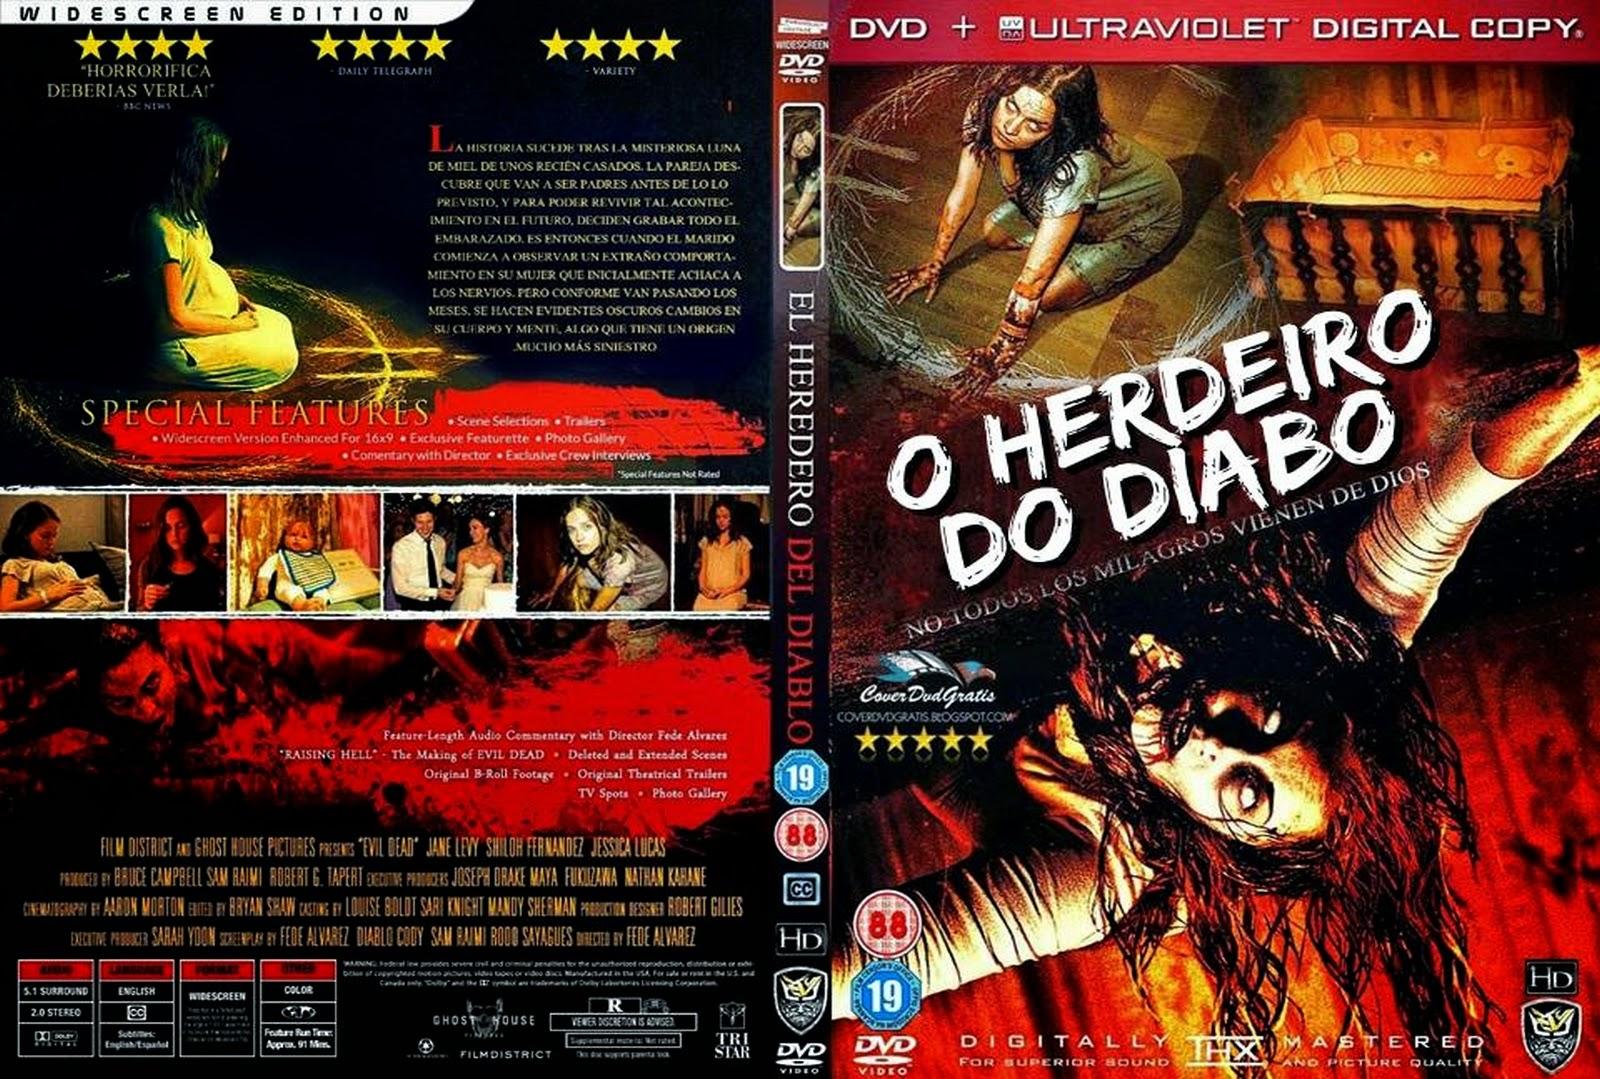 Herdeiro Do Diabo inside o herdeiro do diabo   capas x filmes